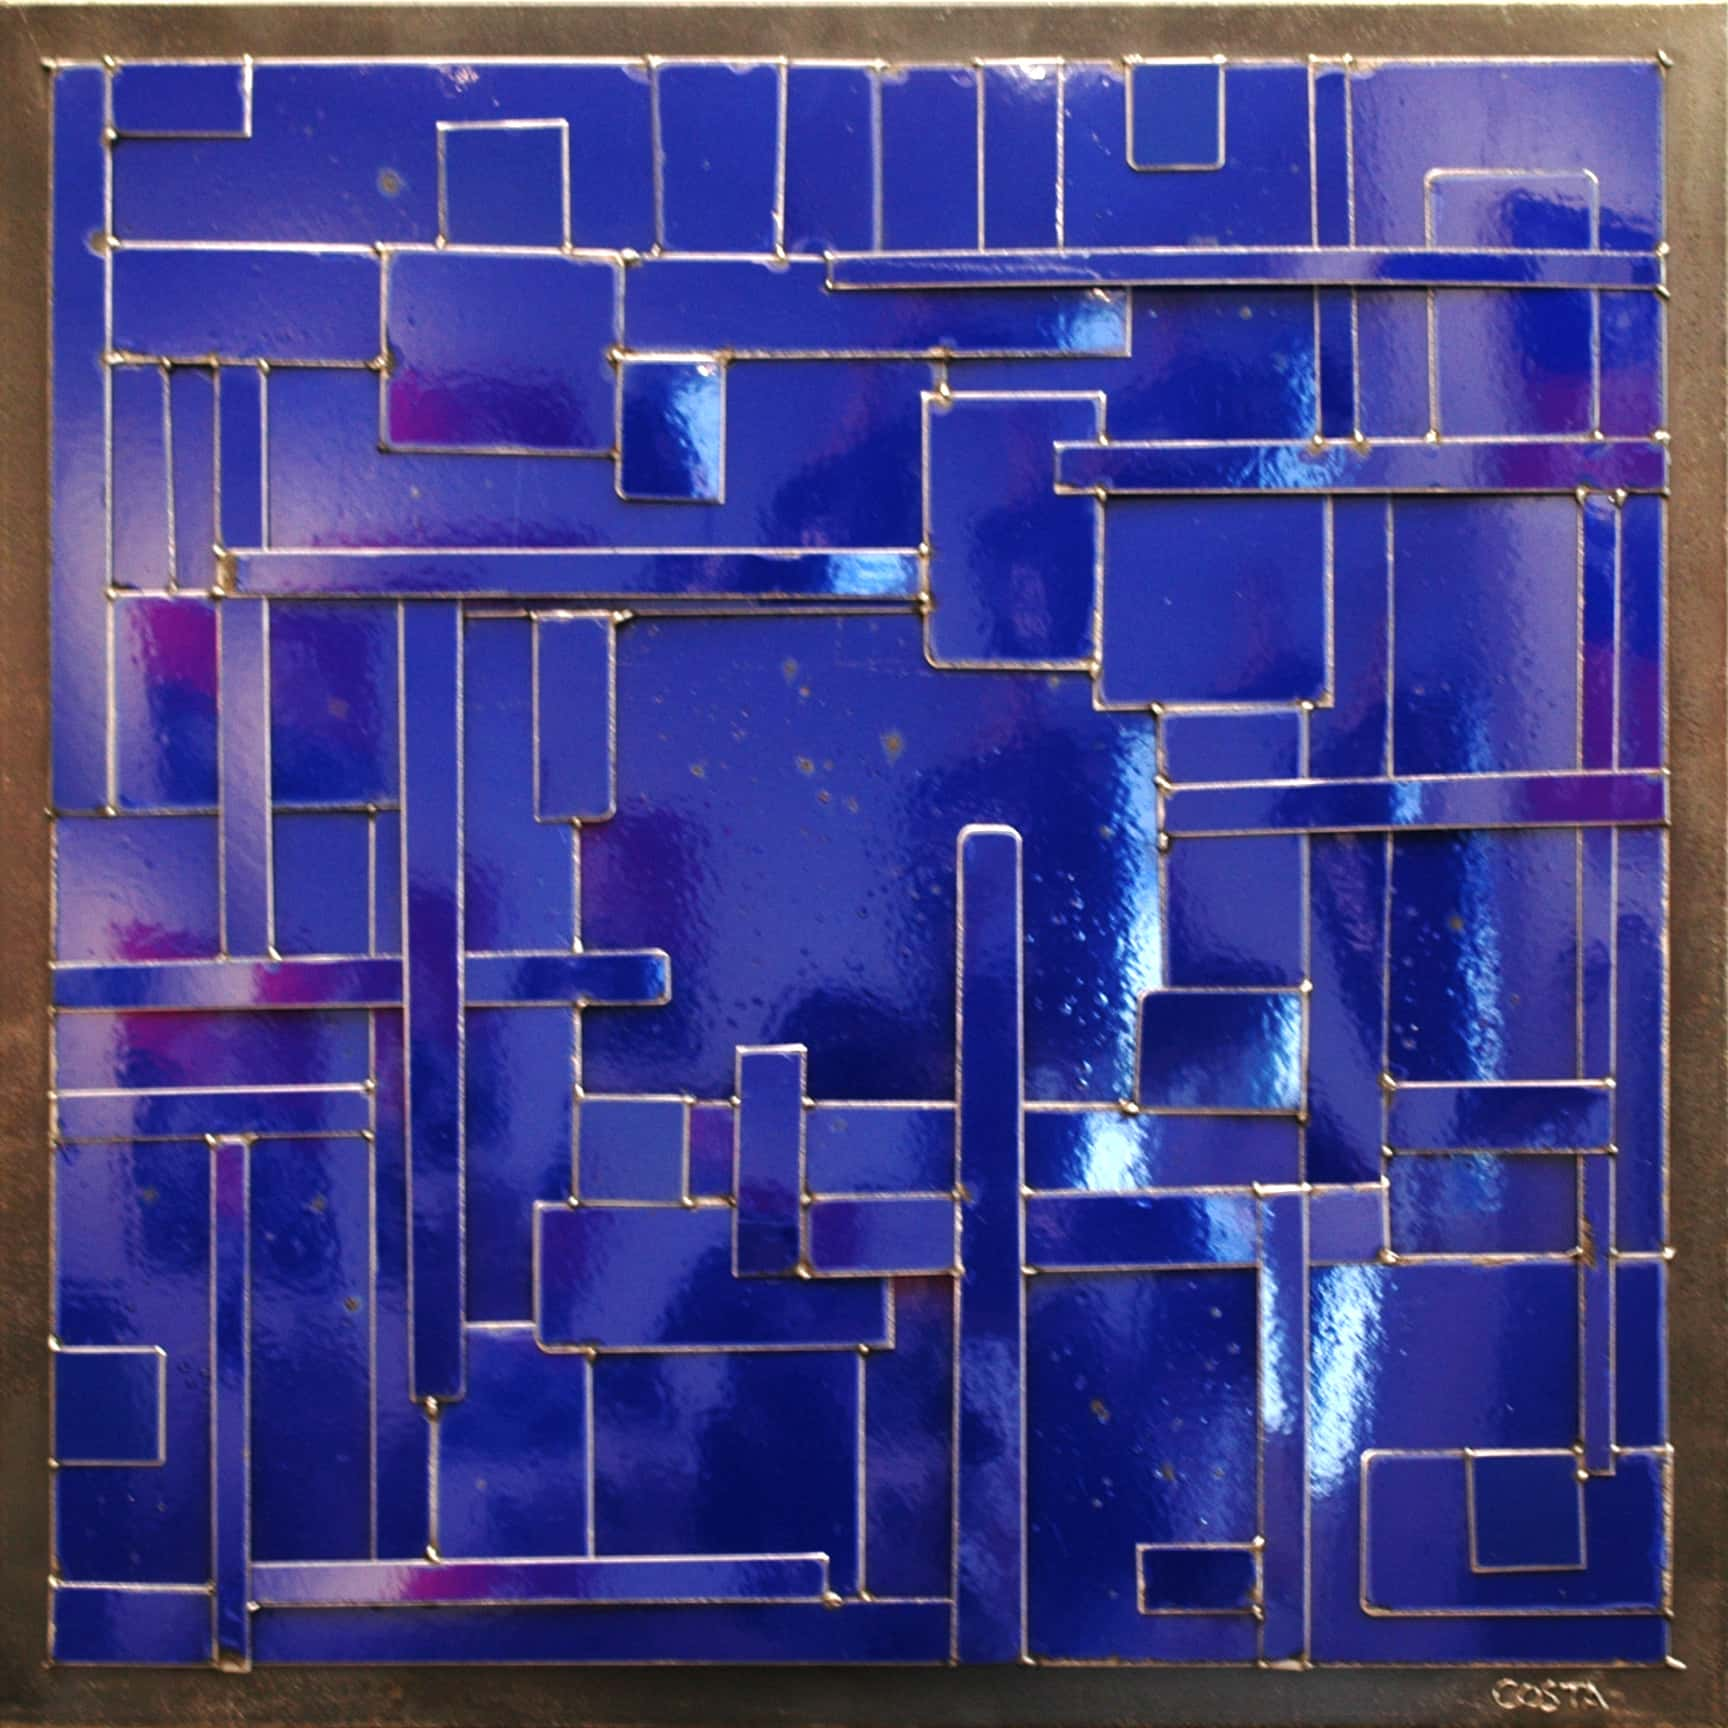 Galerie Art Jingle COSTA Composition Bleu 90 x 90 cm 2021